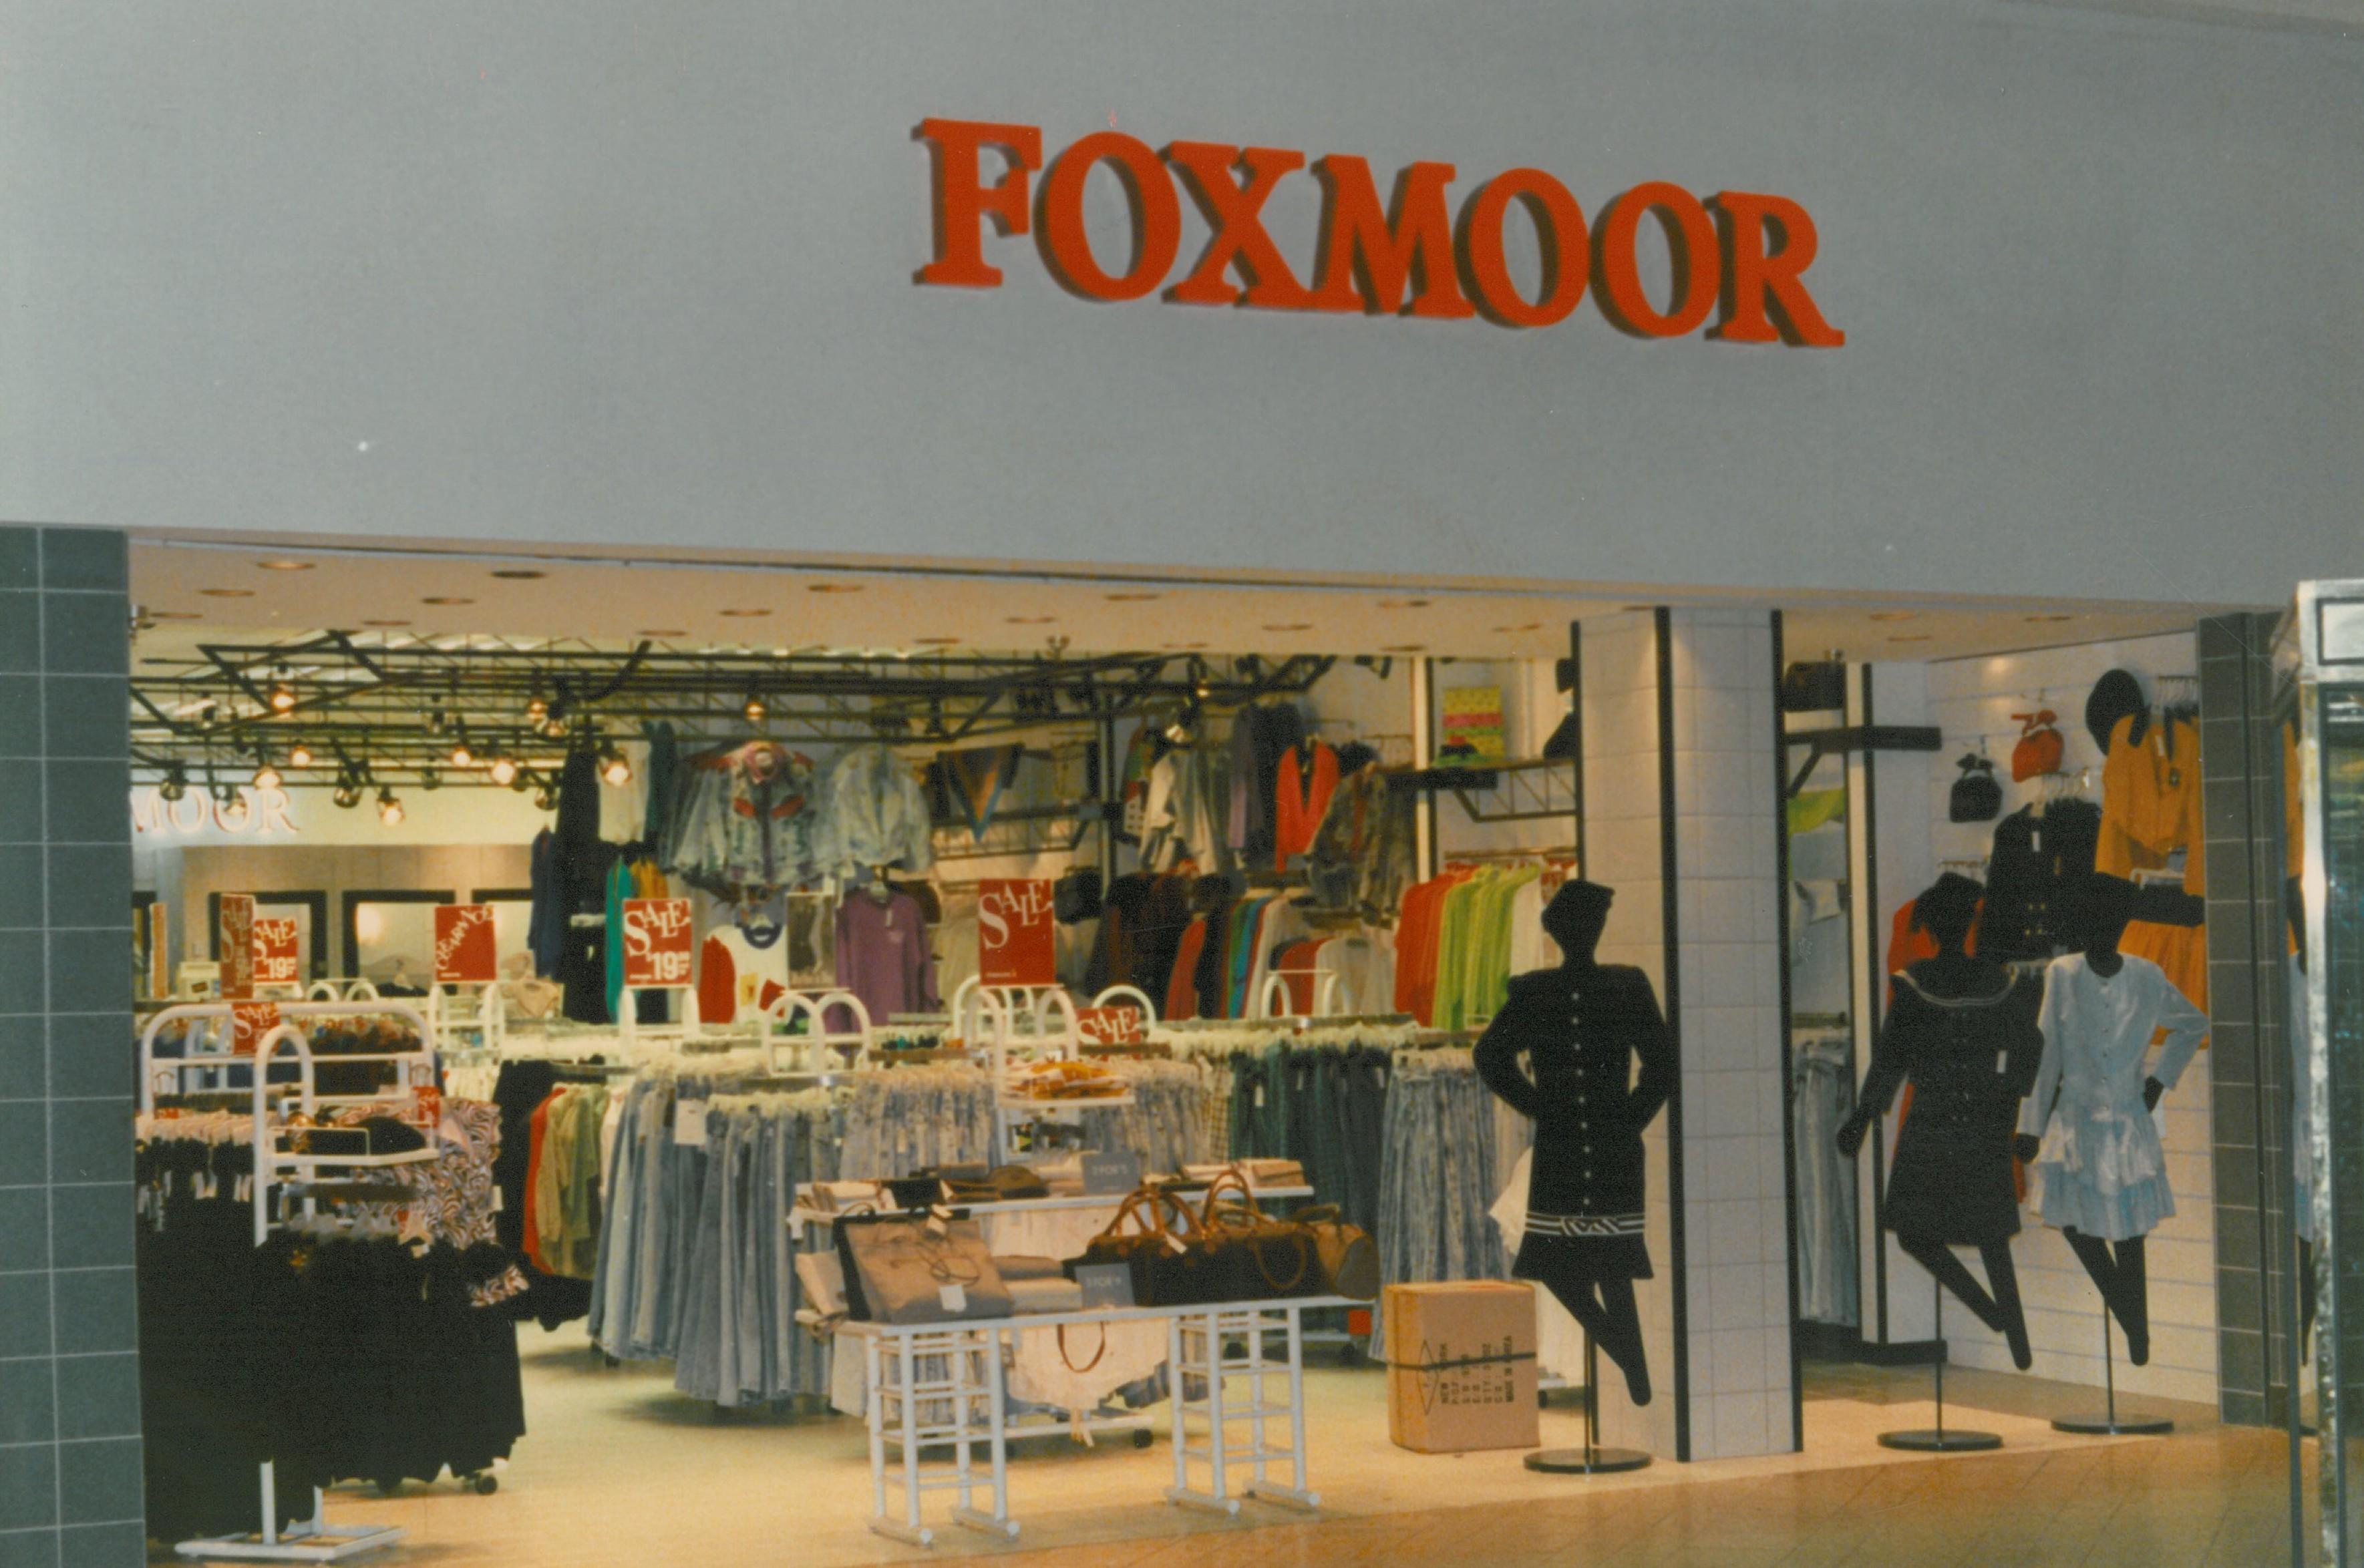 Foxmoor